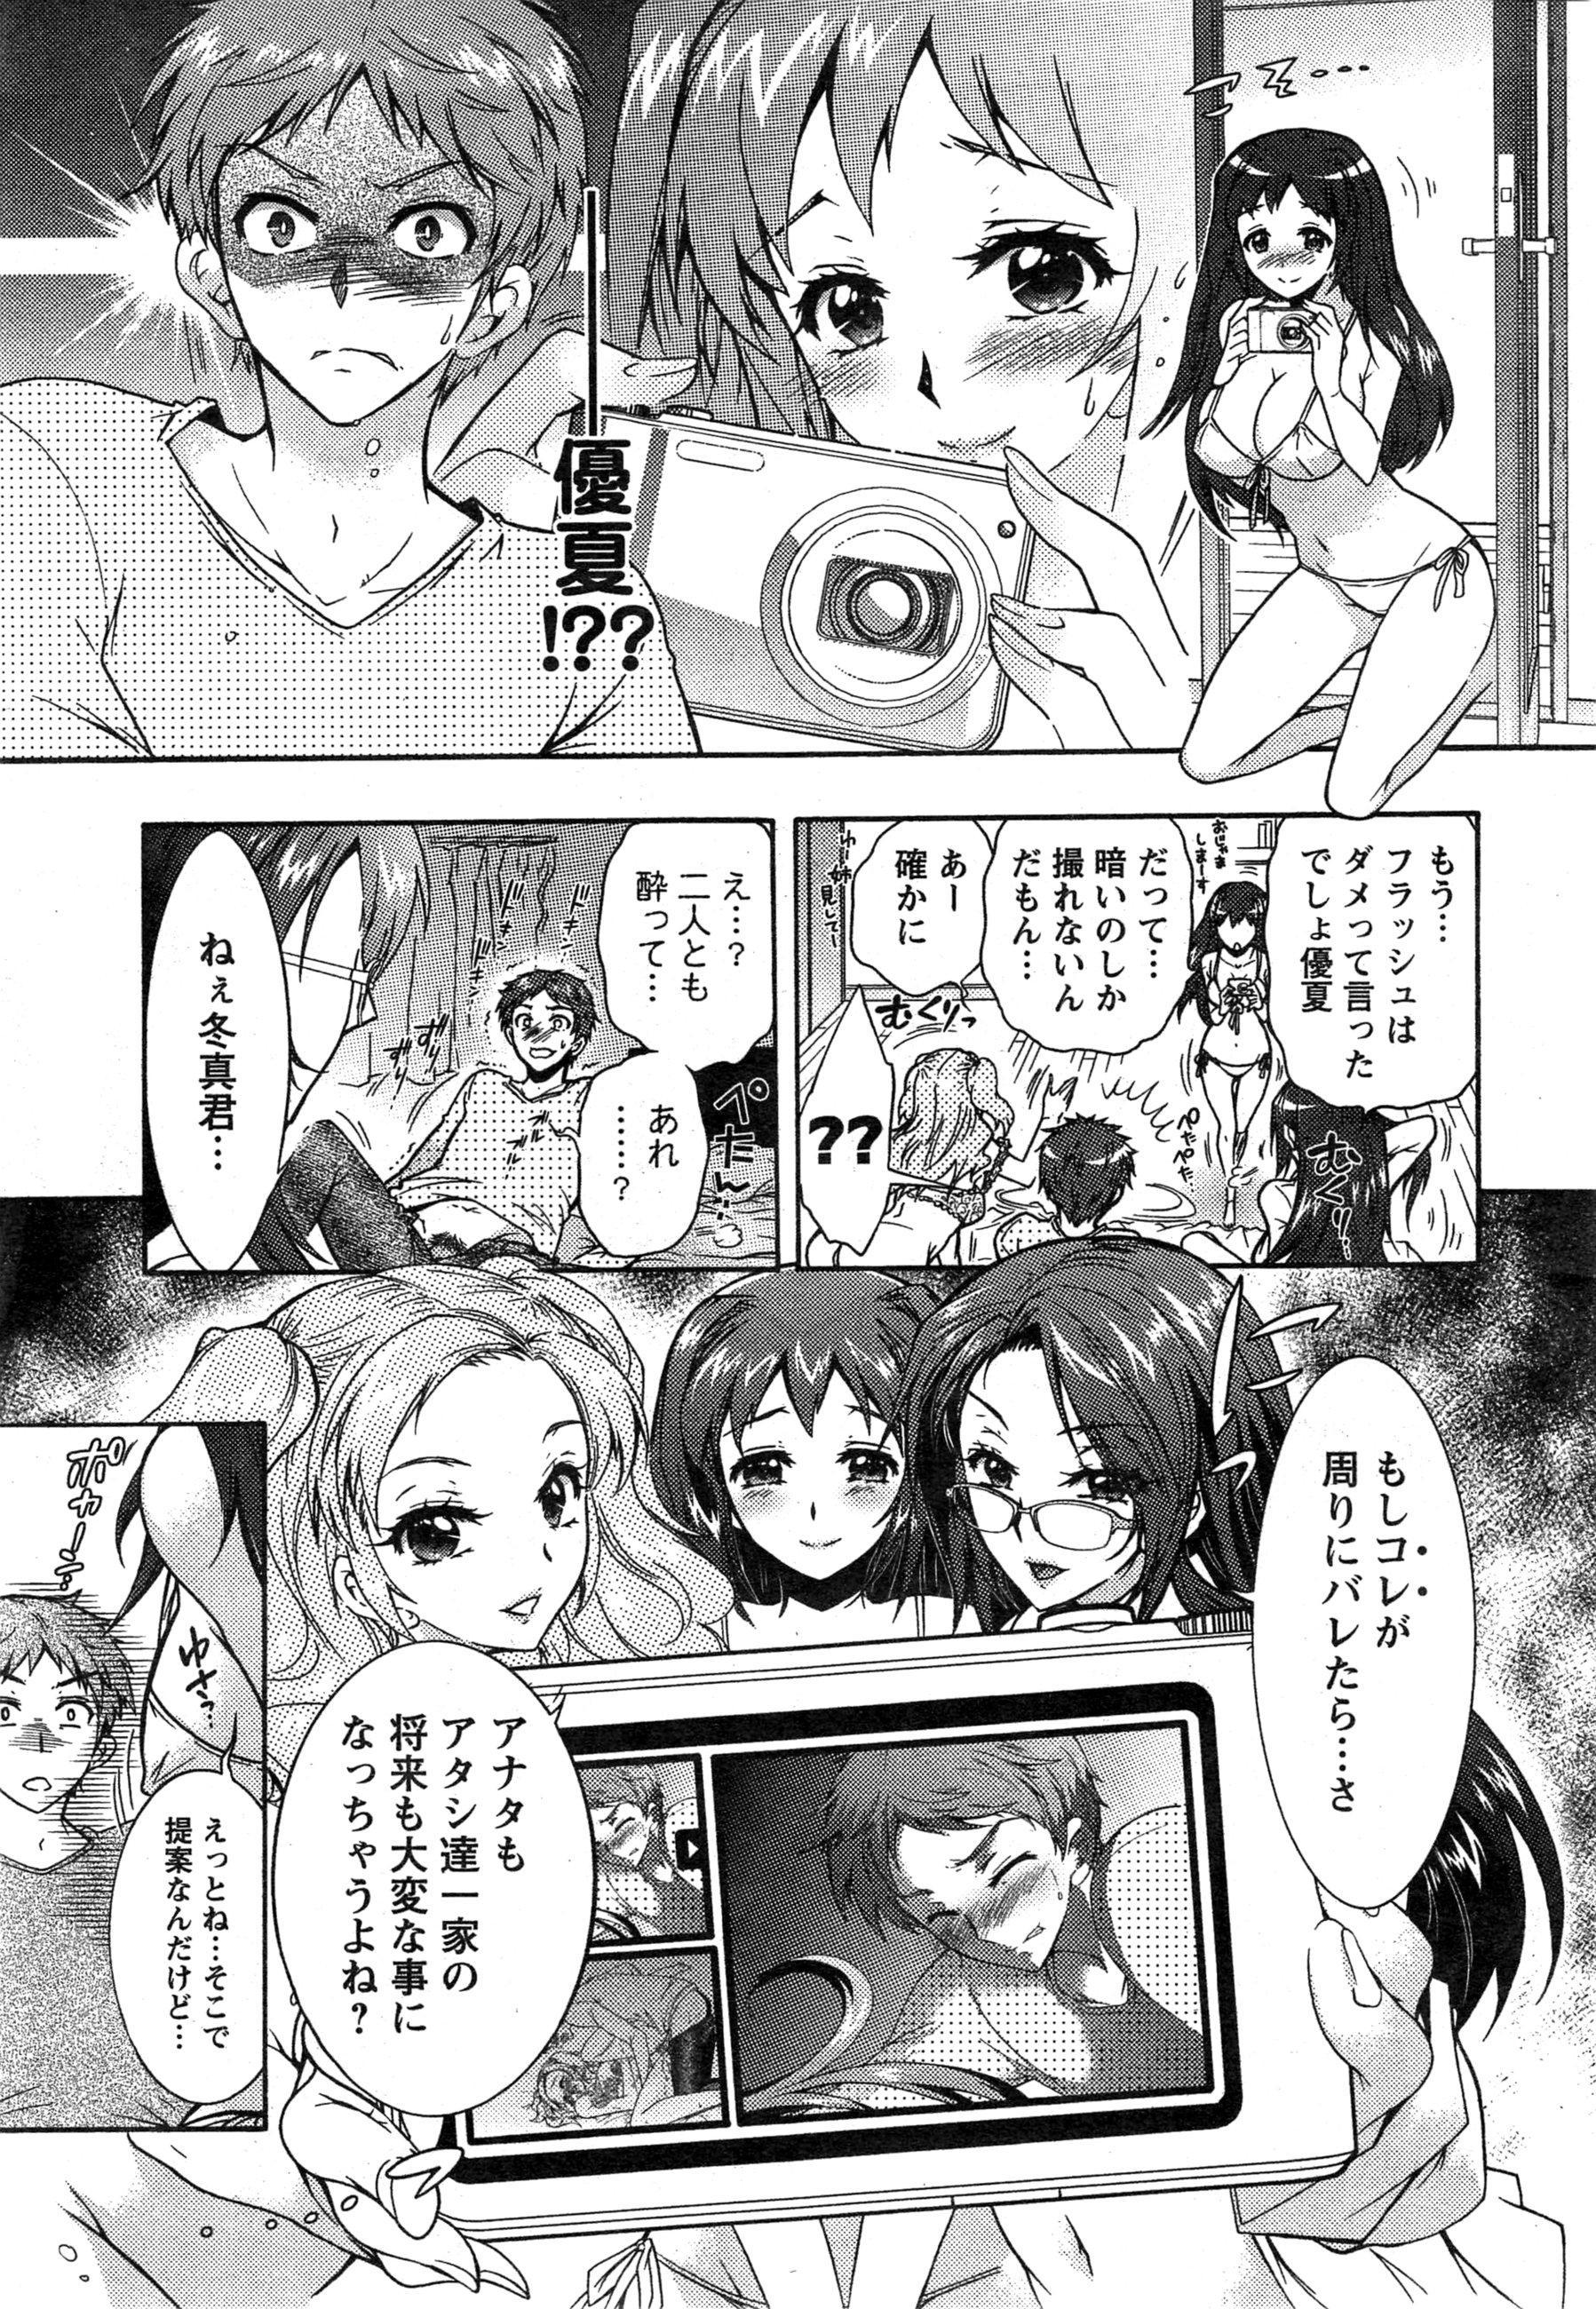 [Honda Arima] Sanshimai no Omocha - The Slave of Three Sisters Ch. 1-6 19